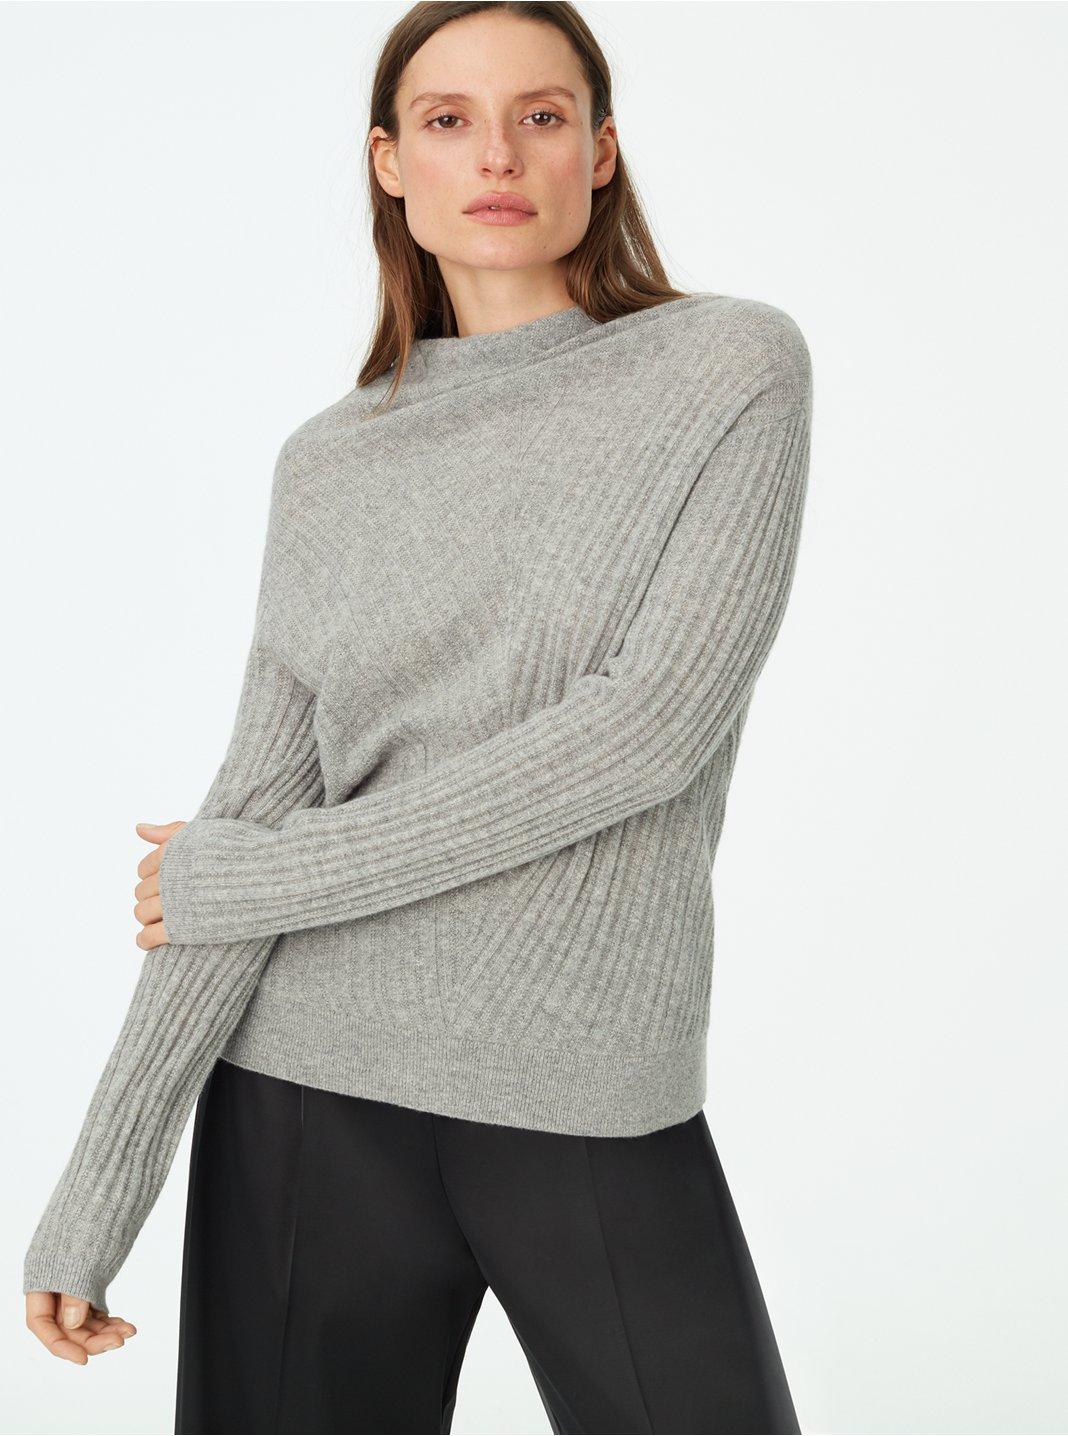 Amarynth Cashmere Sweater